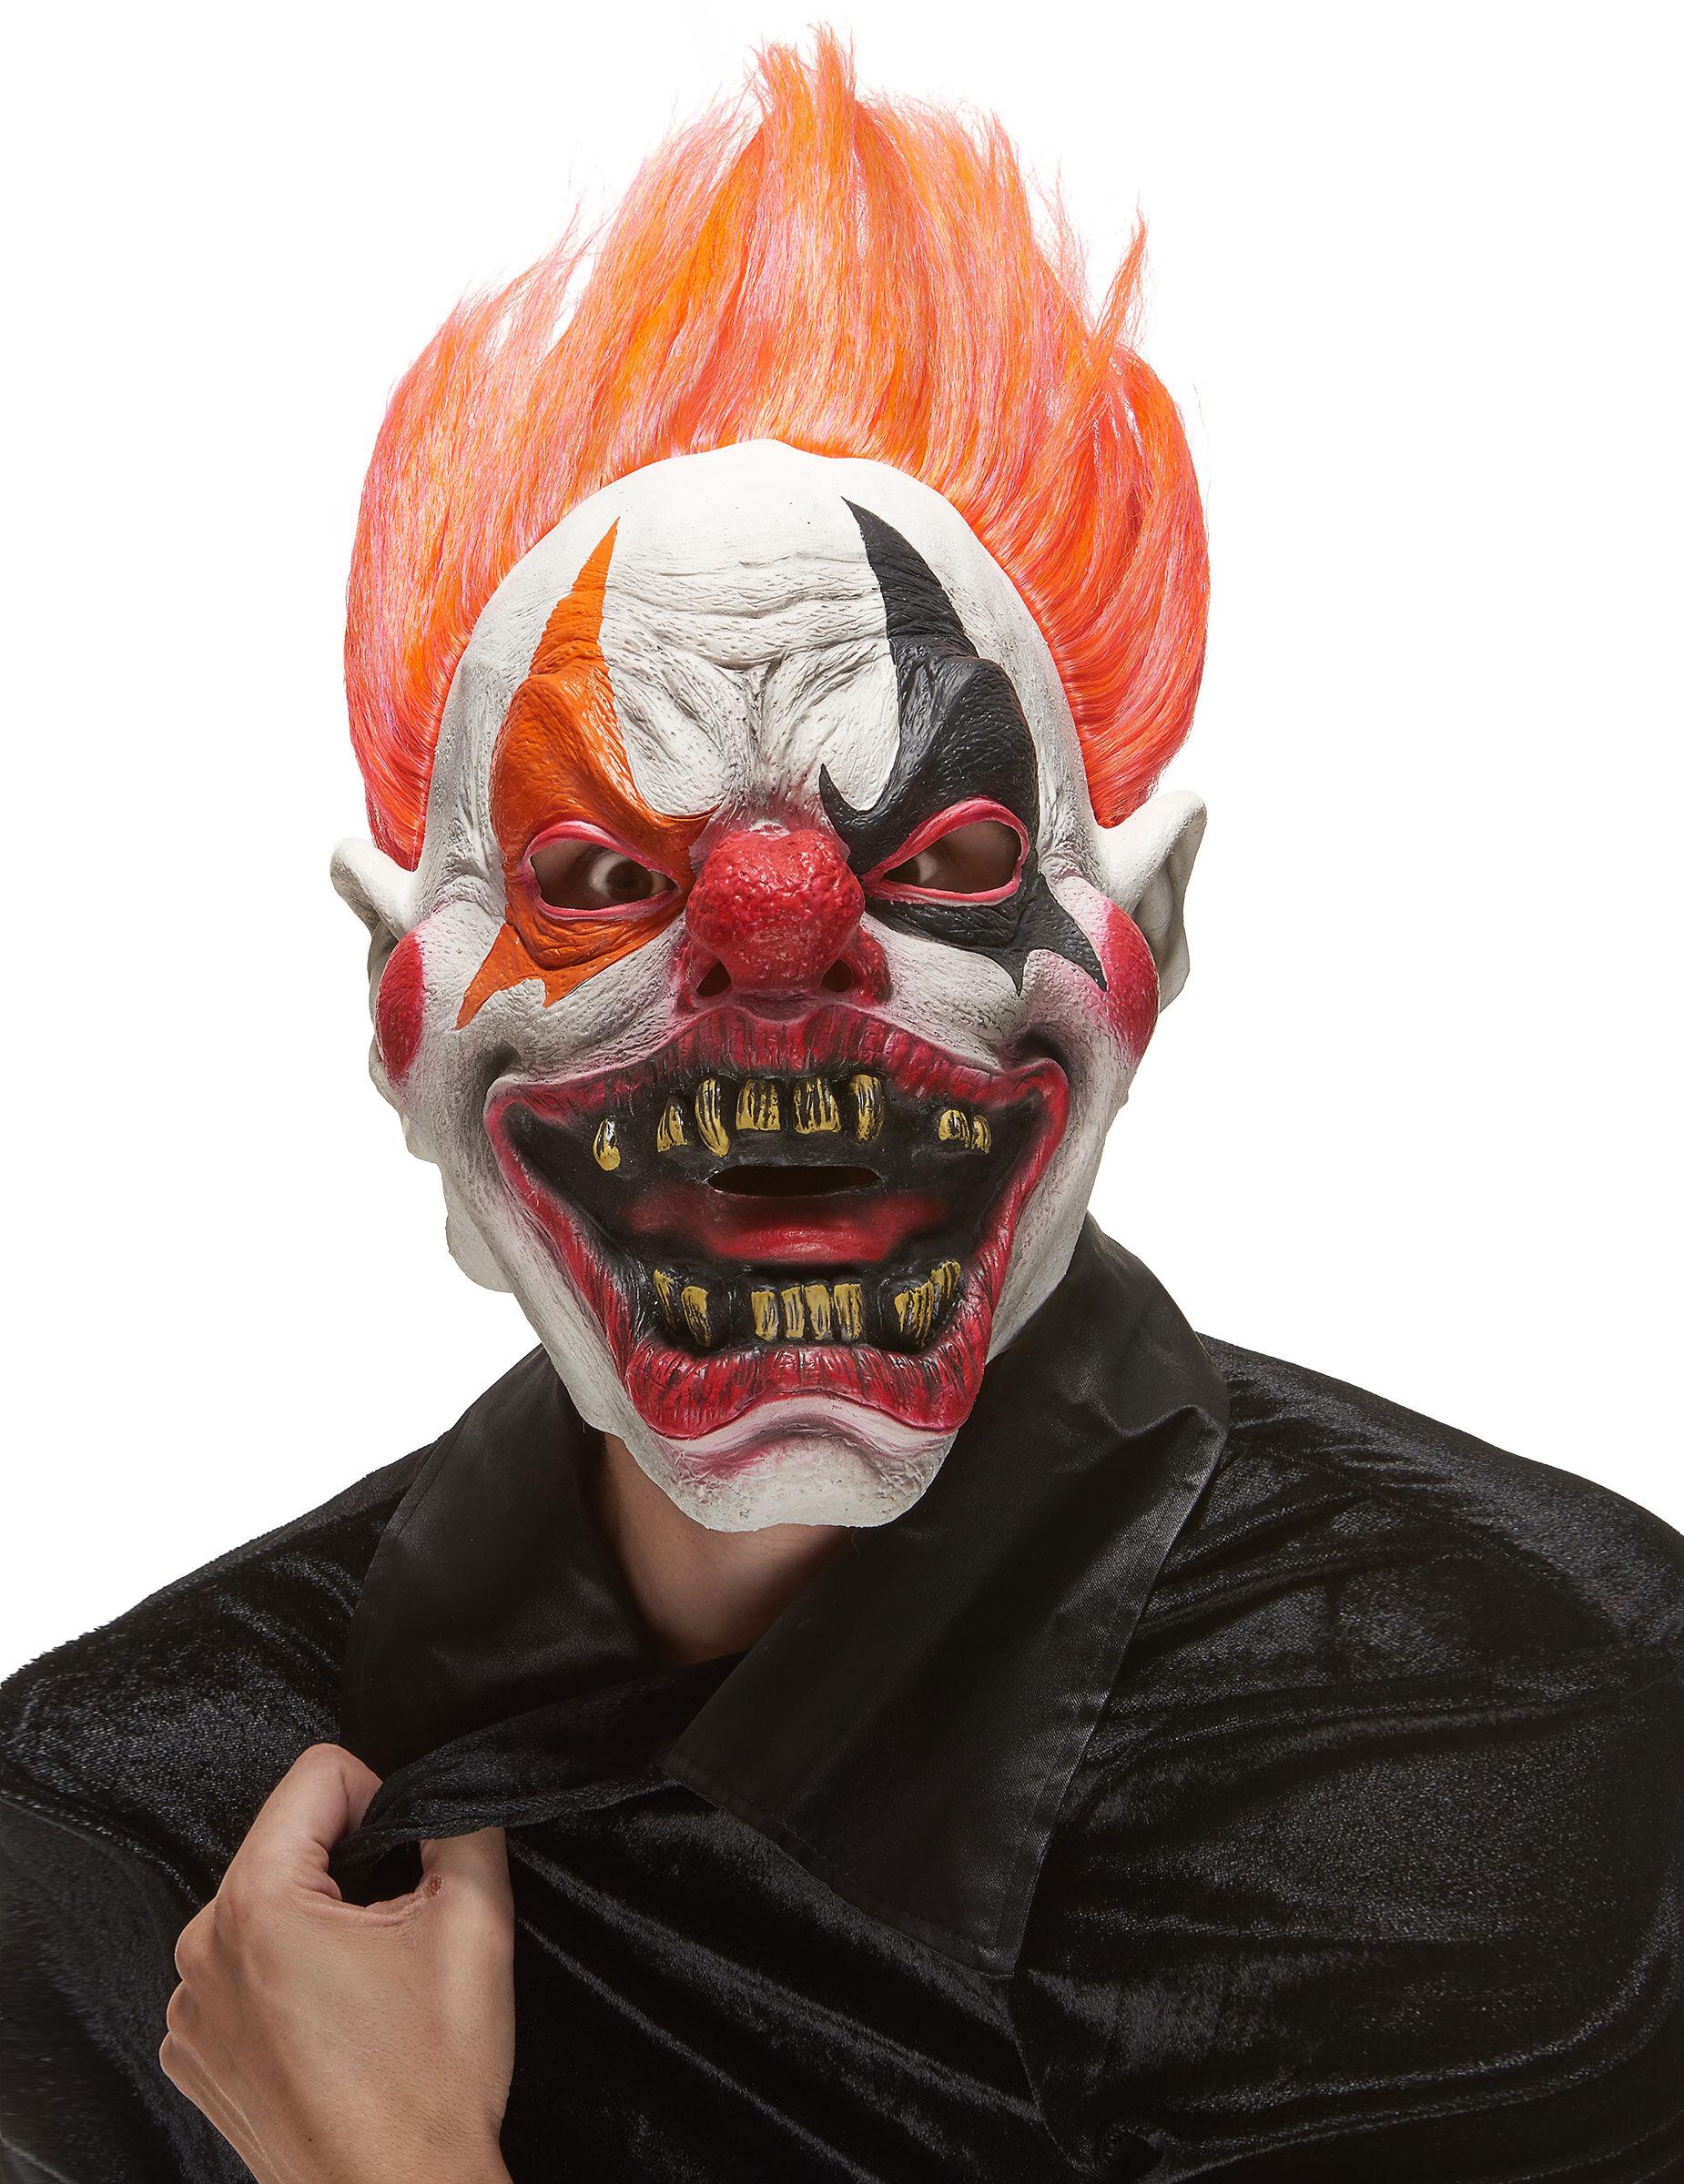 vegaoo maschera integrale da clown infernale